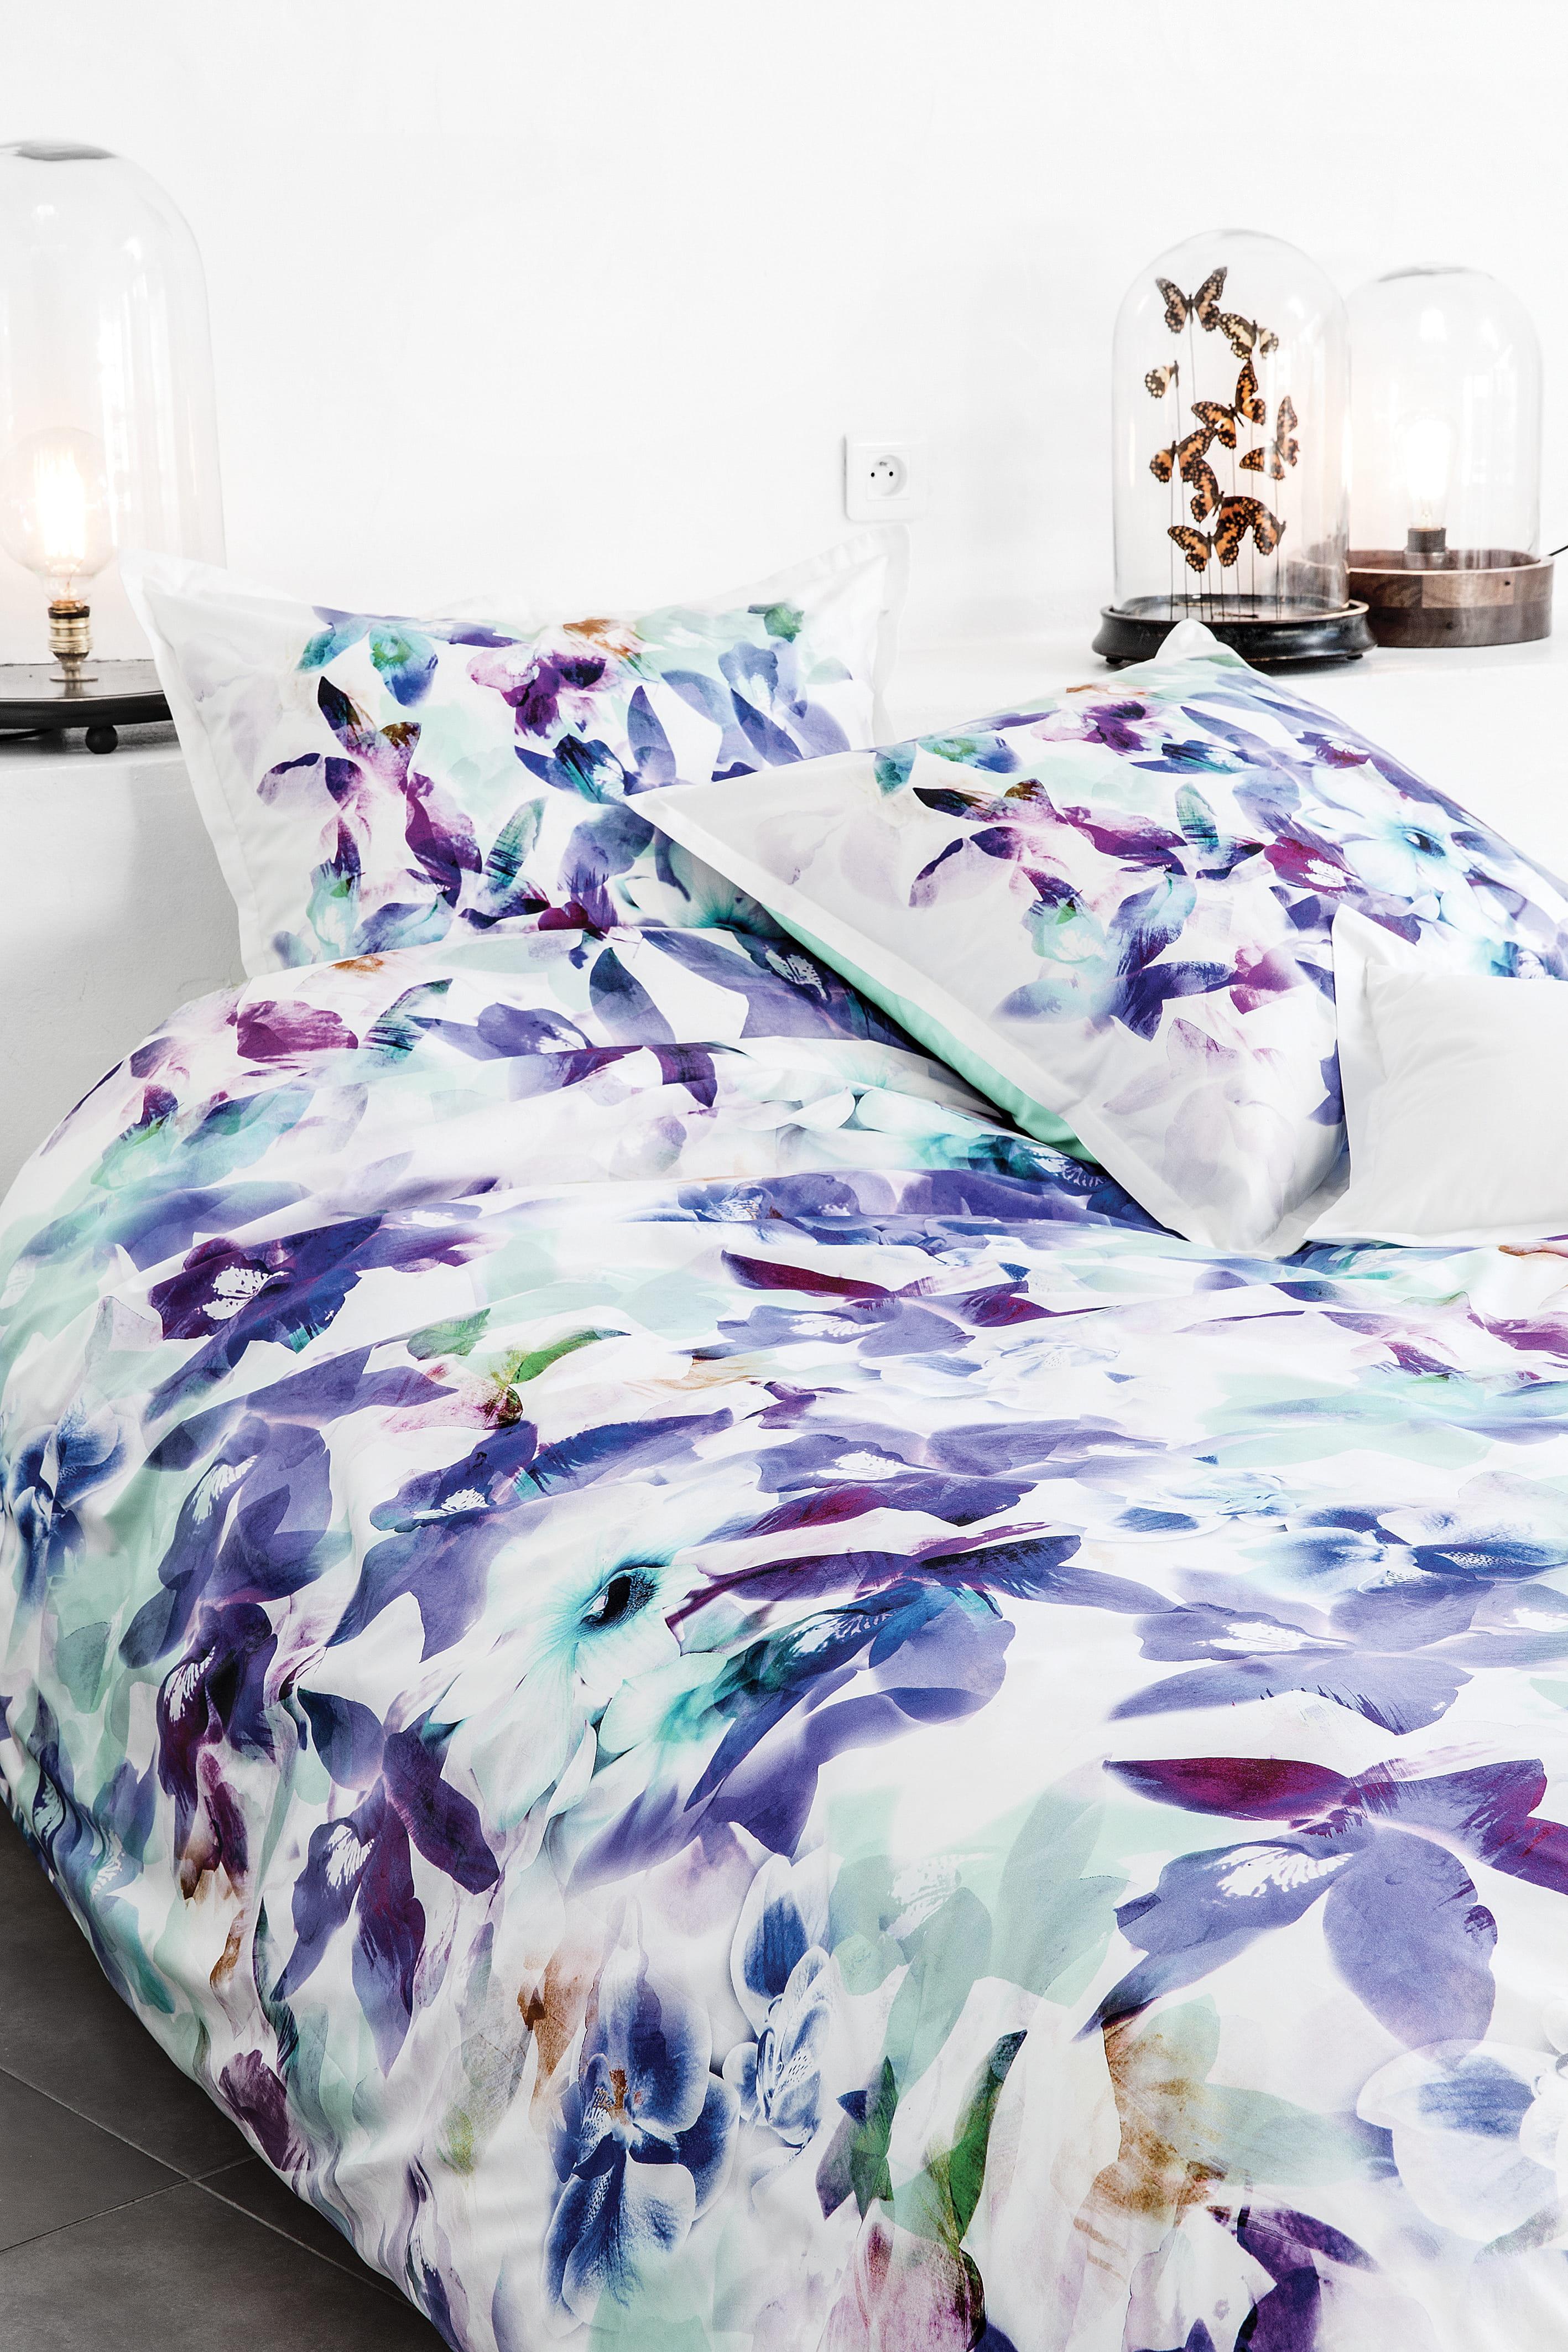 linge de lit fleuri bleu de carr blanc. Black Bedroom Furniture Sets. Home Design Ideas